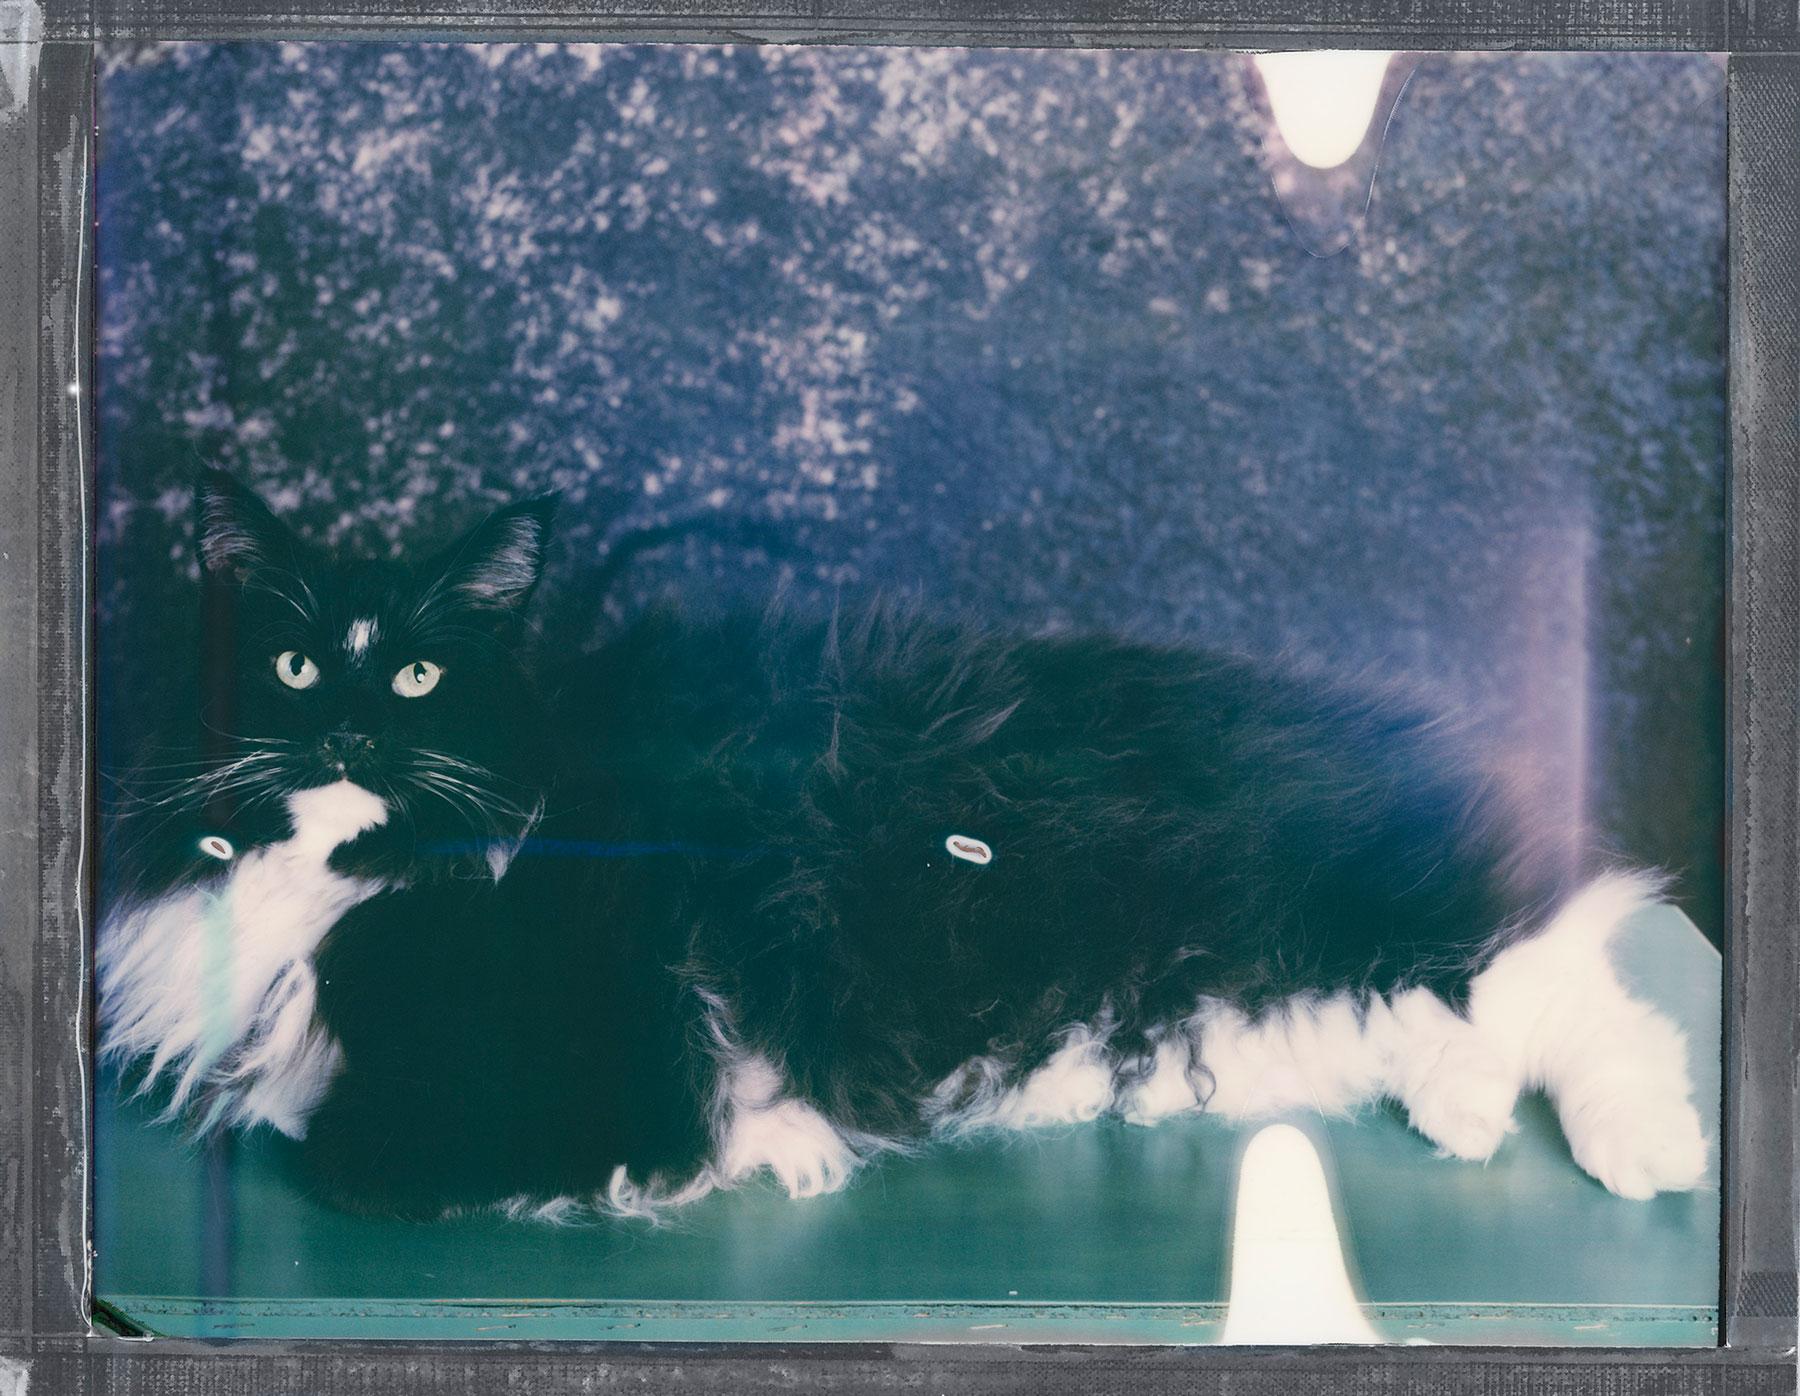 bilde av en katt tatt av portrettfotograf Oslo